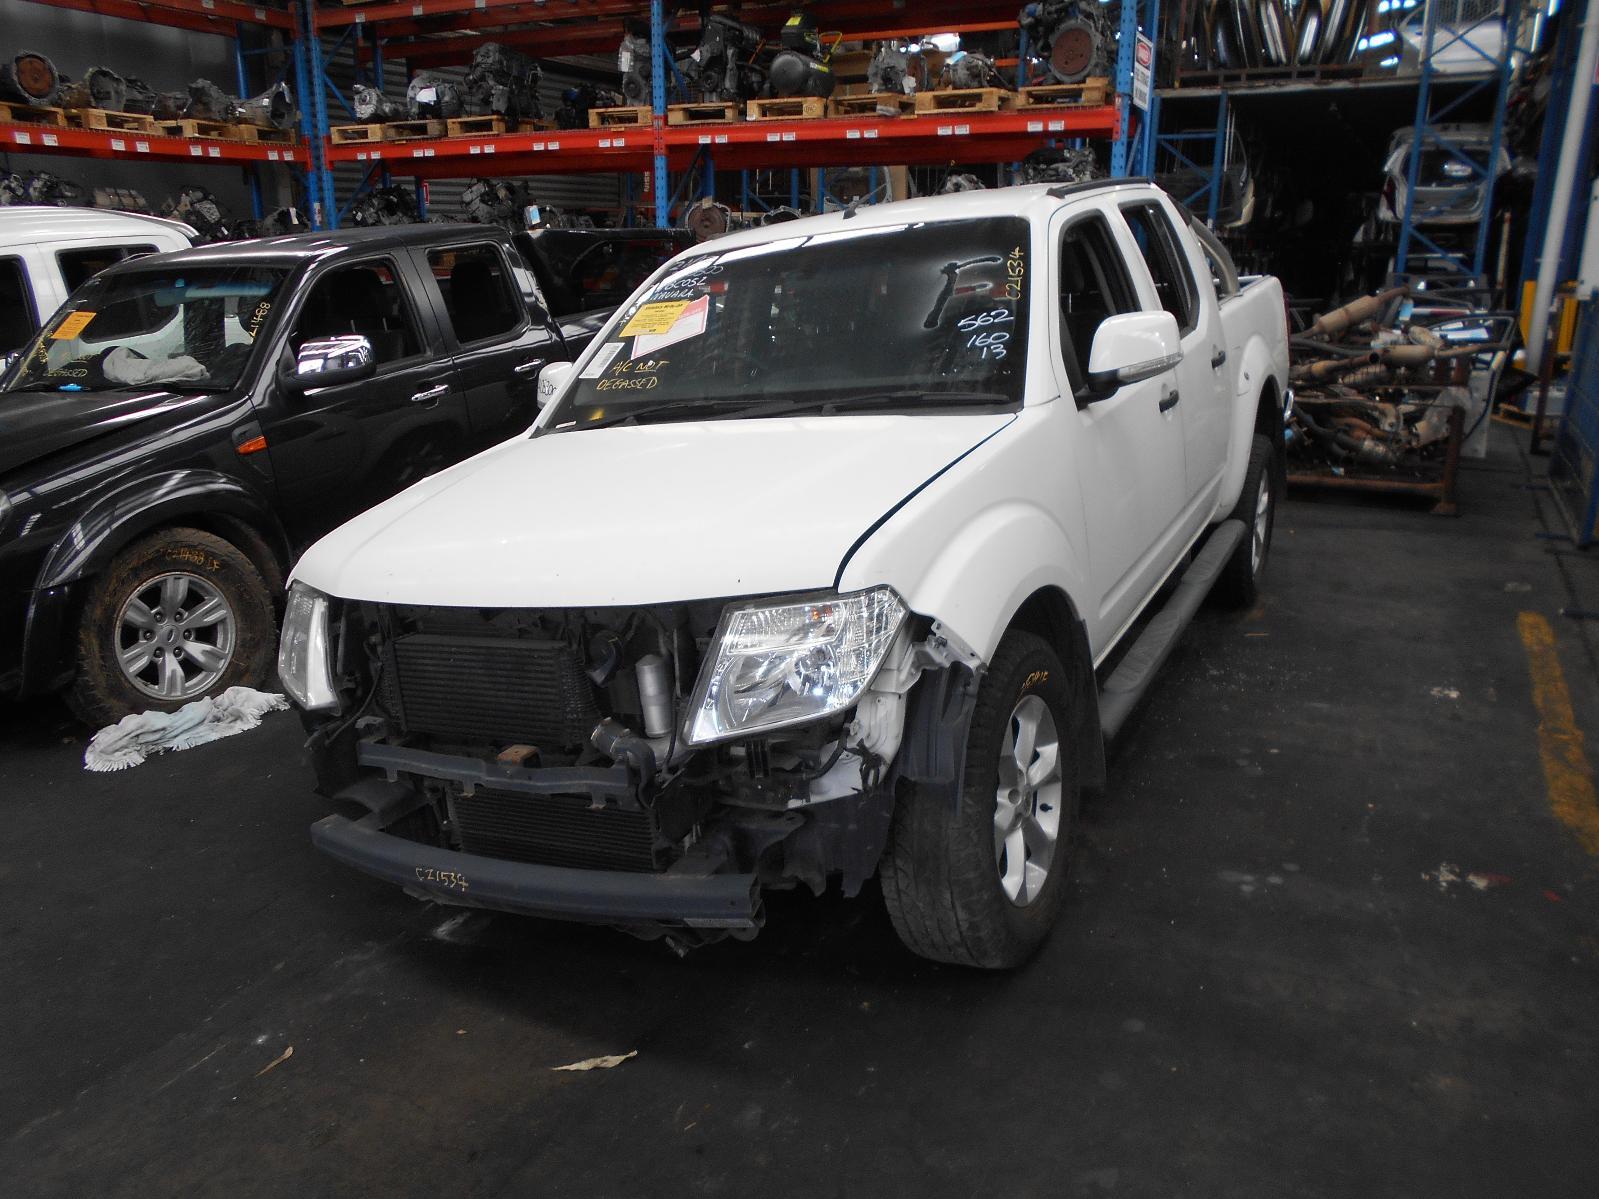 Nissan Navara Starter Motor Diesel 25 Yd25 140kw Turbo D40 Fuse Box Location 2 5